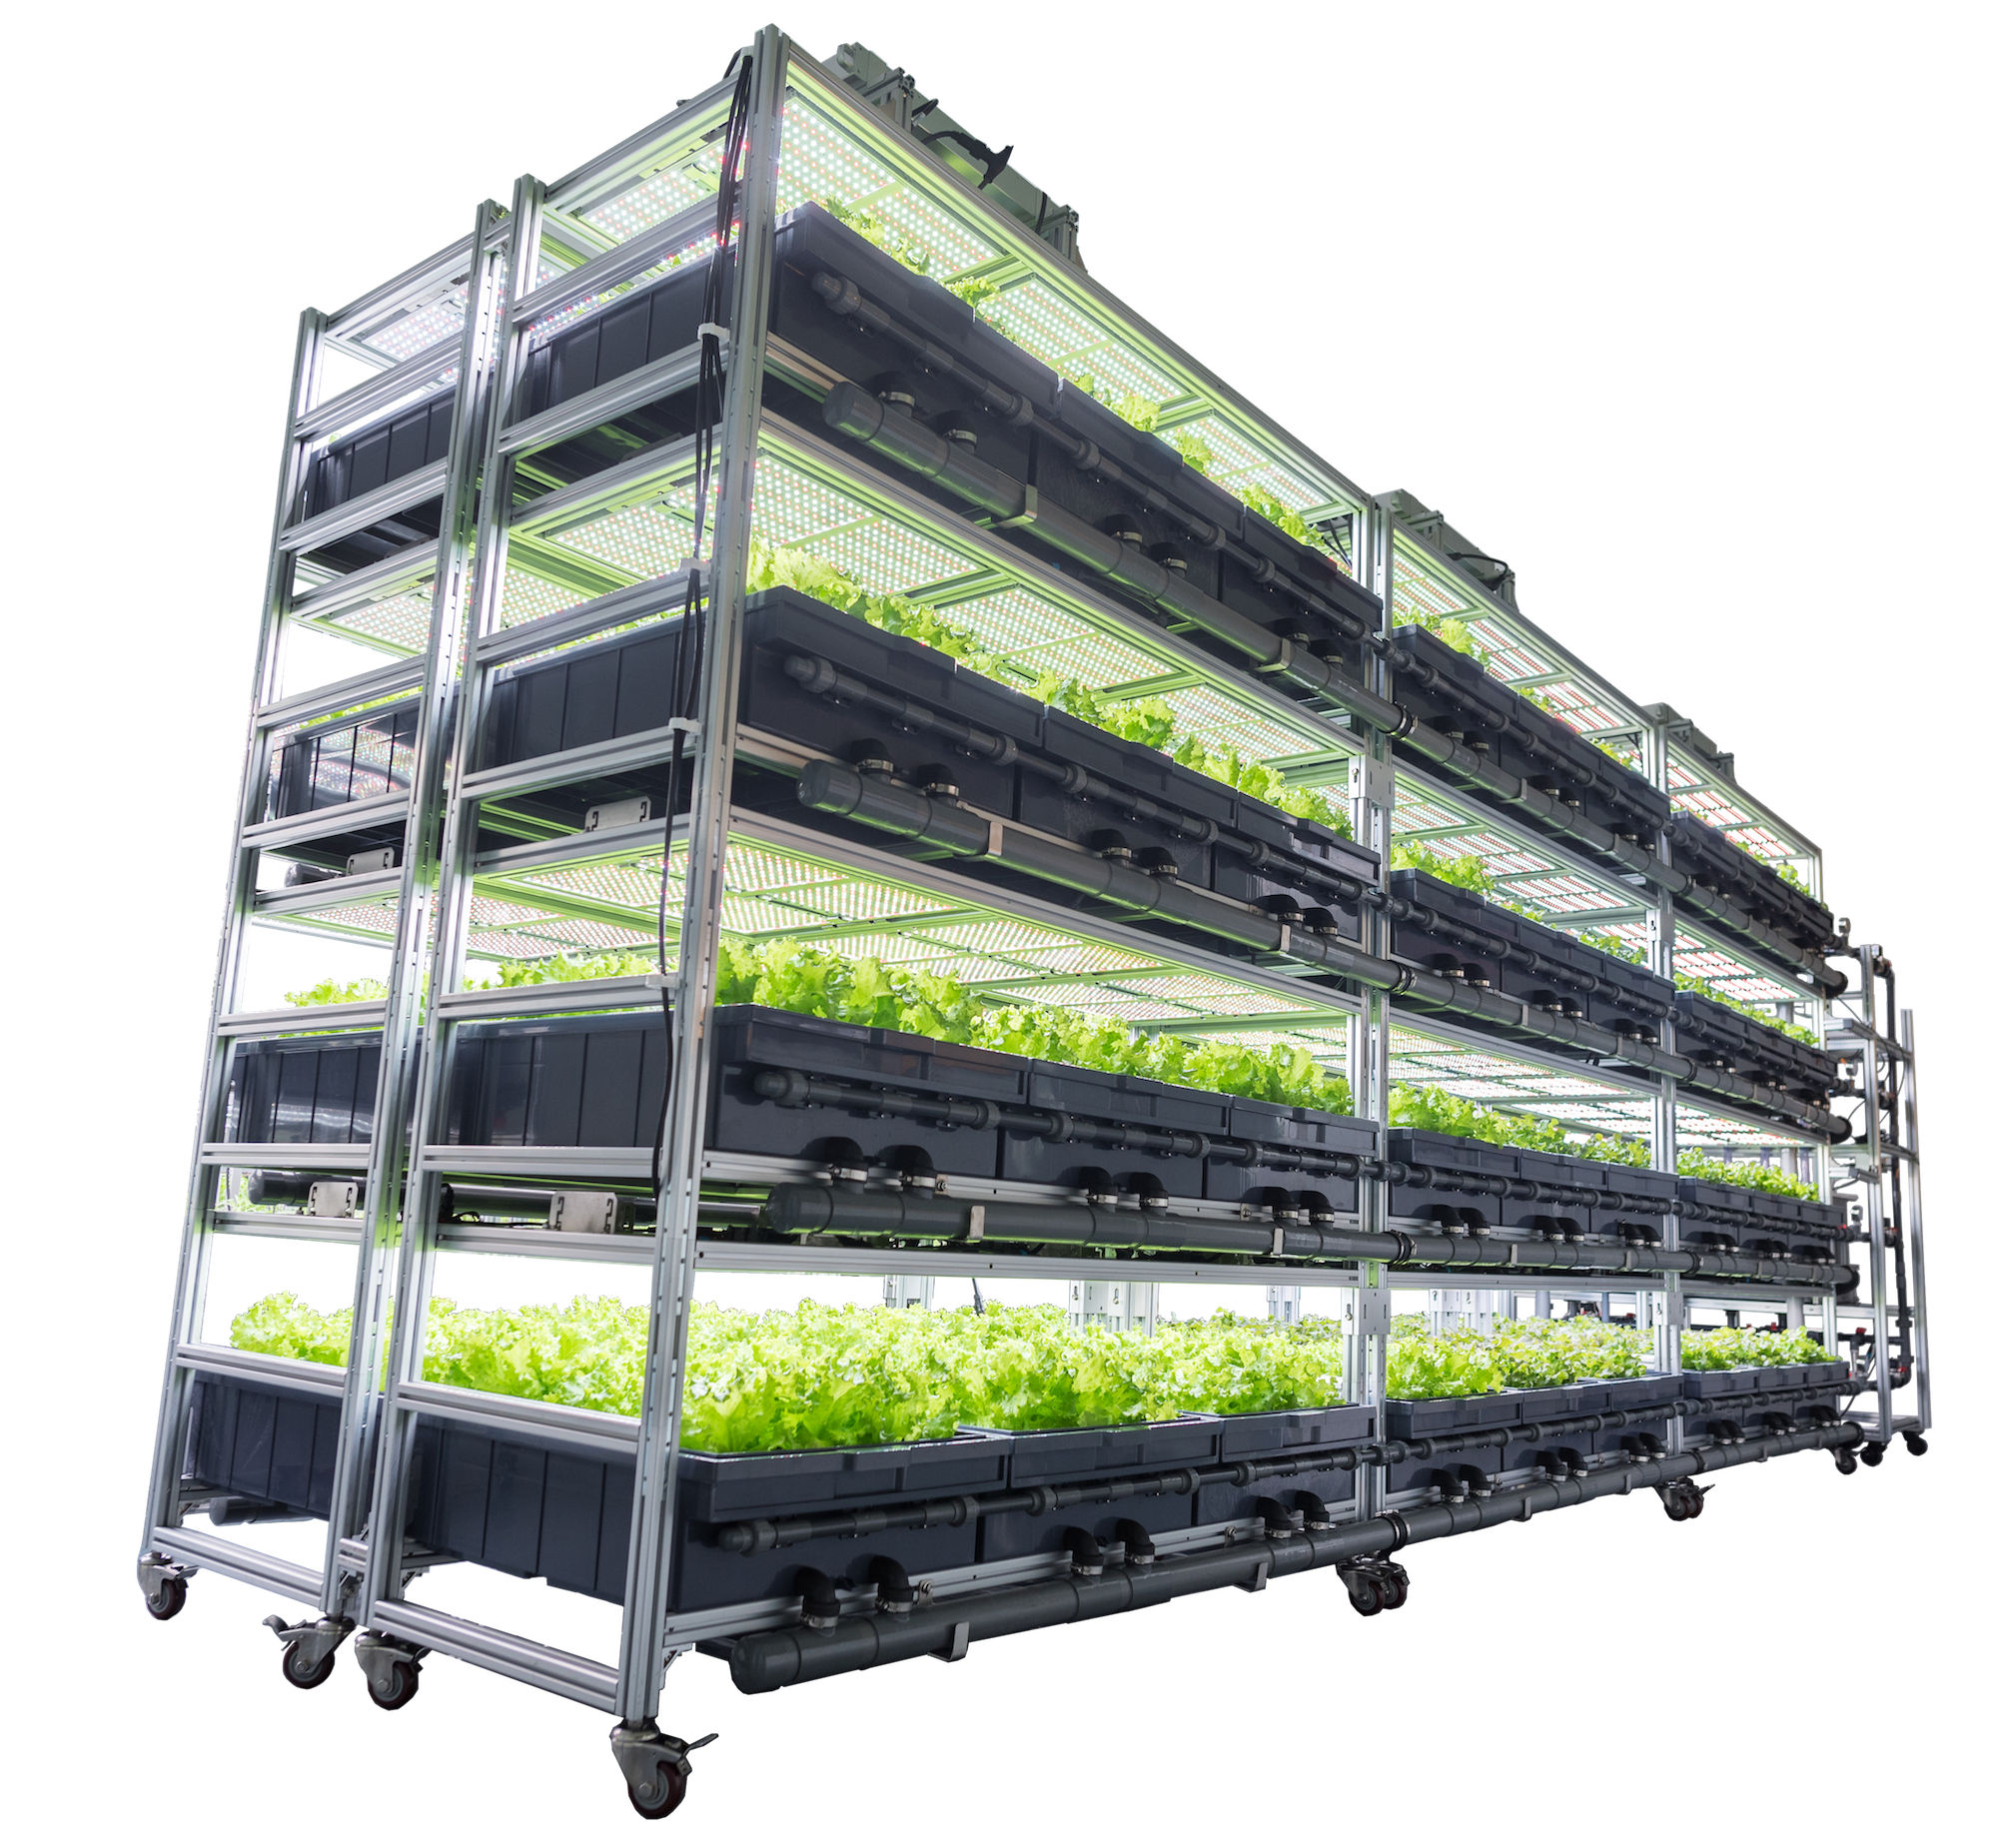 AEtrium SmartFarm with Lettuce